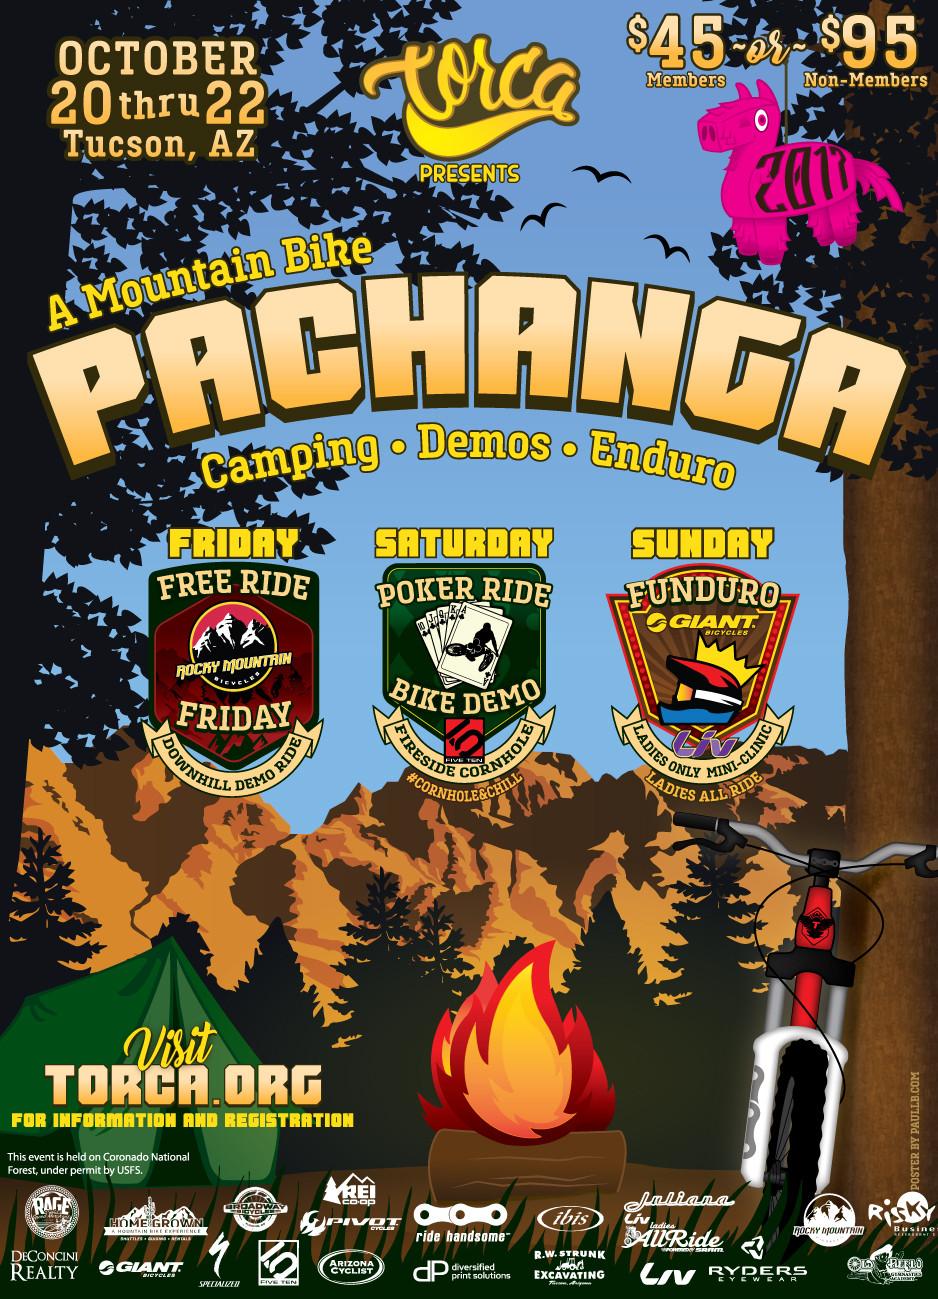 Pachanga For Your Soul - 2017 TORCA Pachanga MTB Festival in Tucson, AZ